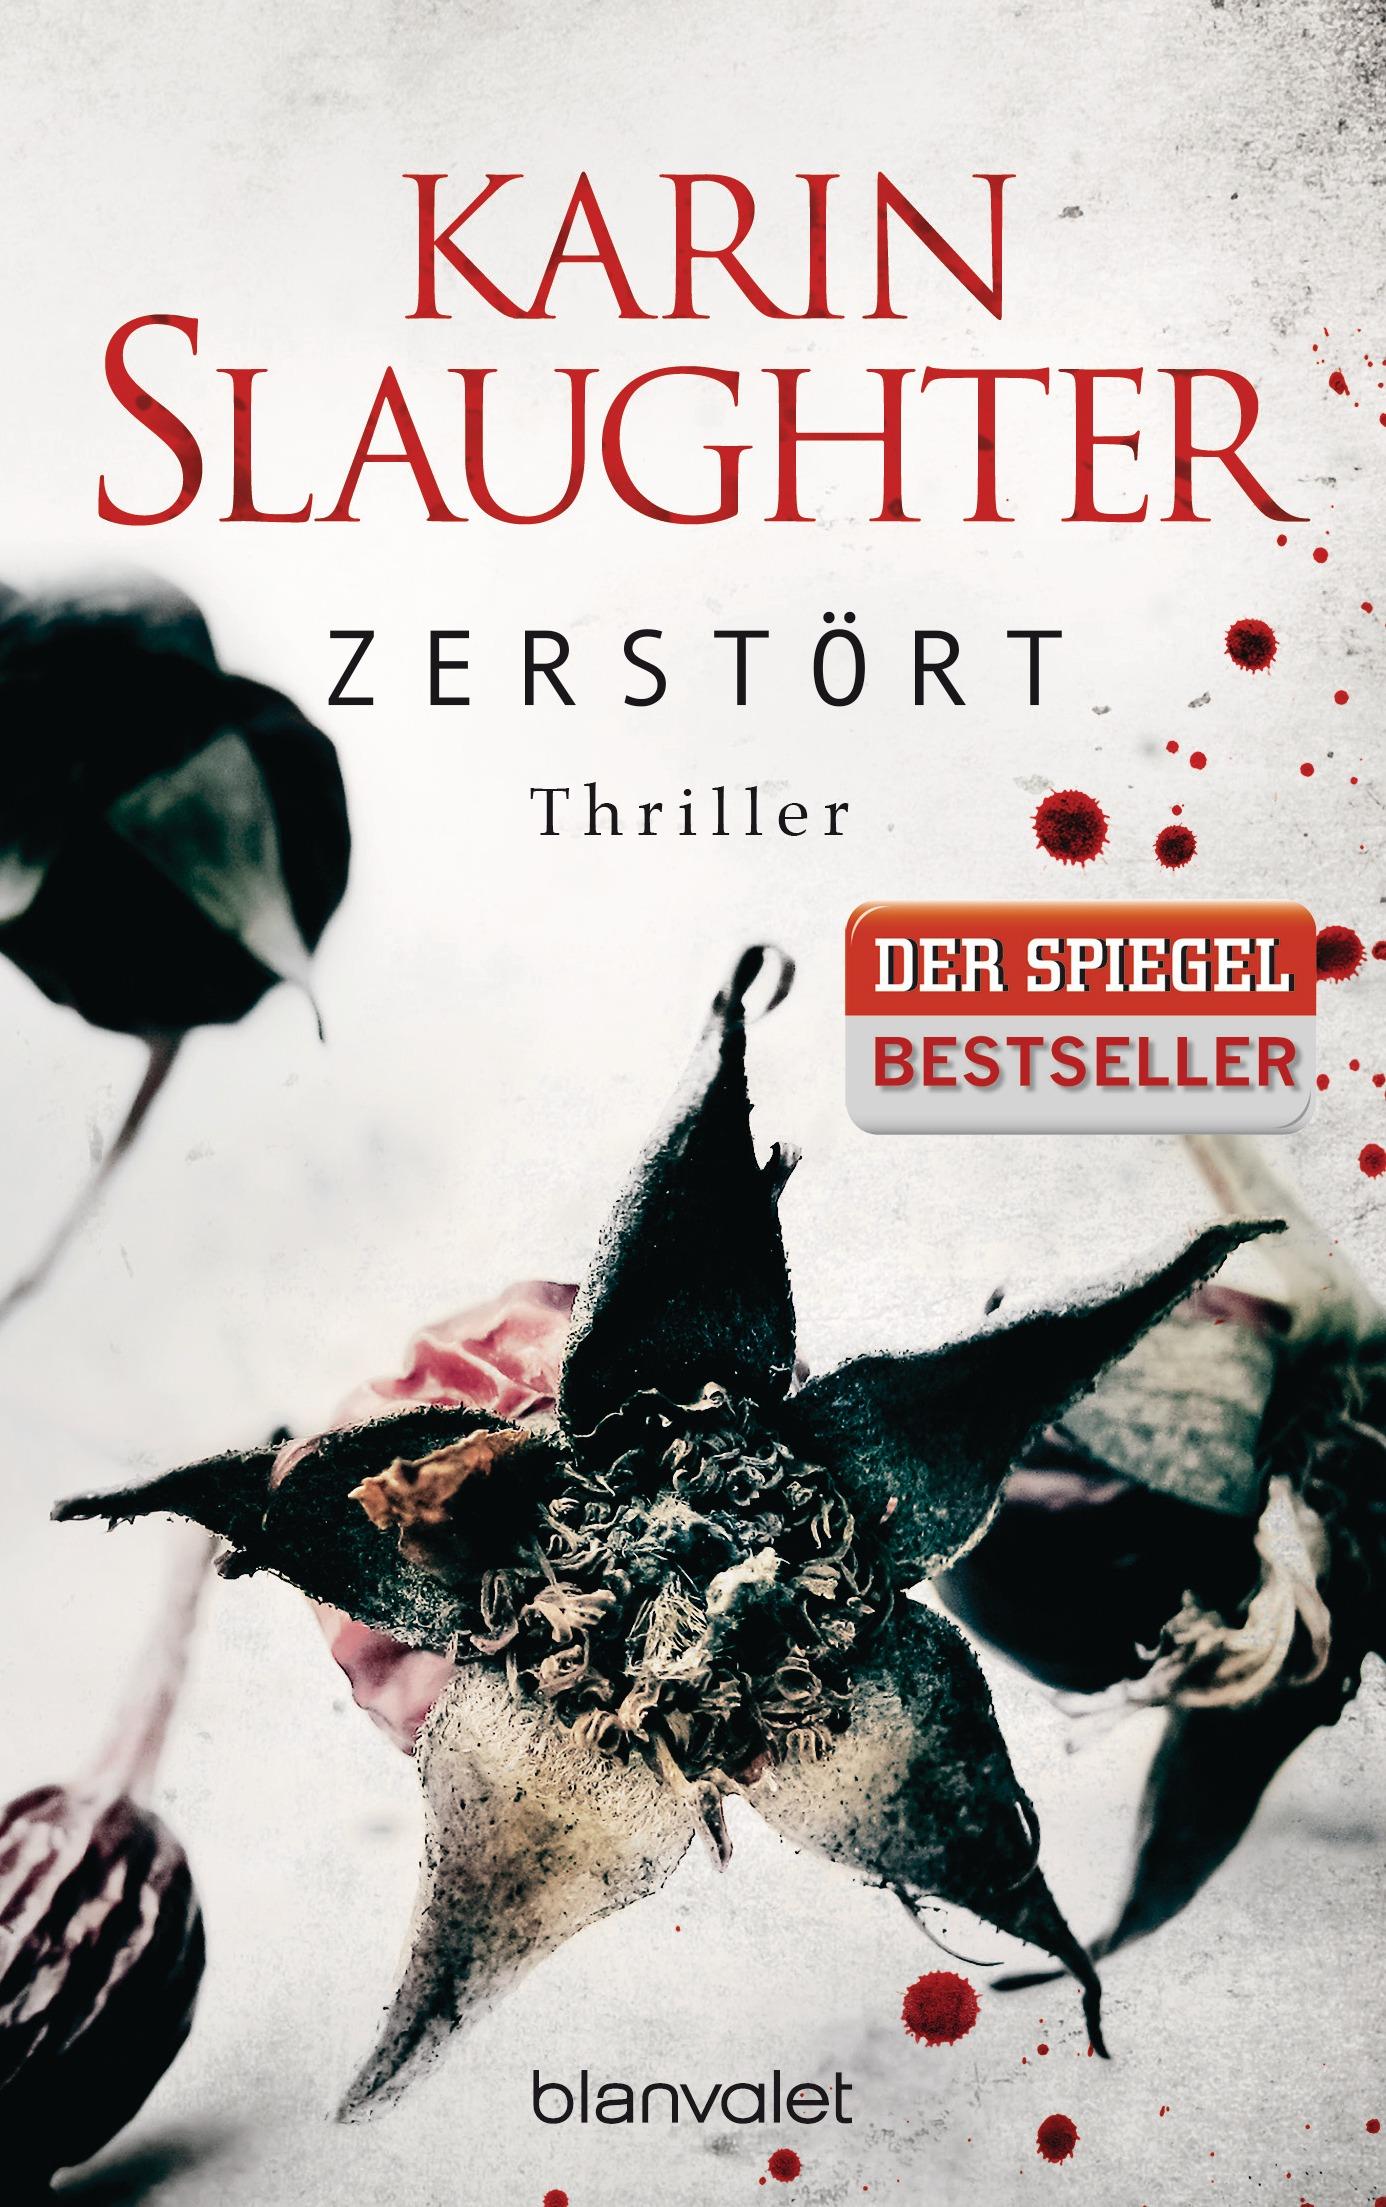 Zerstört: Thriller - Karin Slaughter